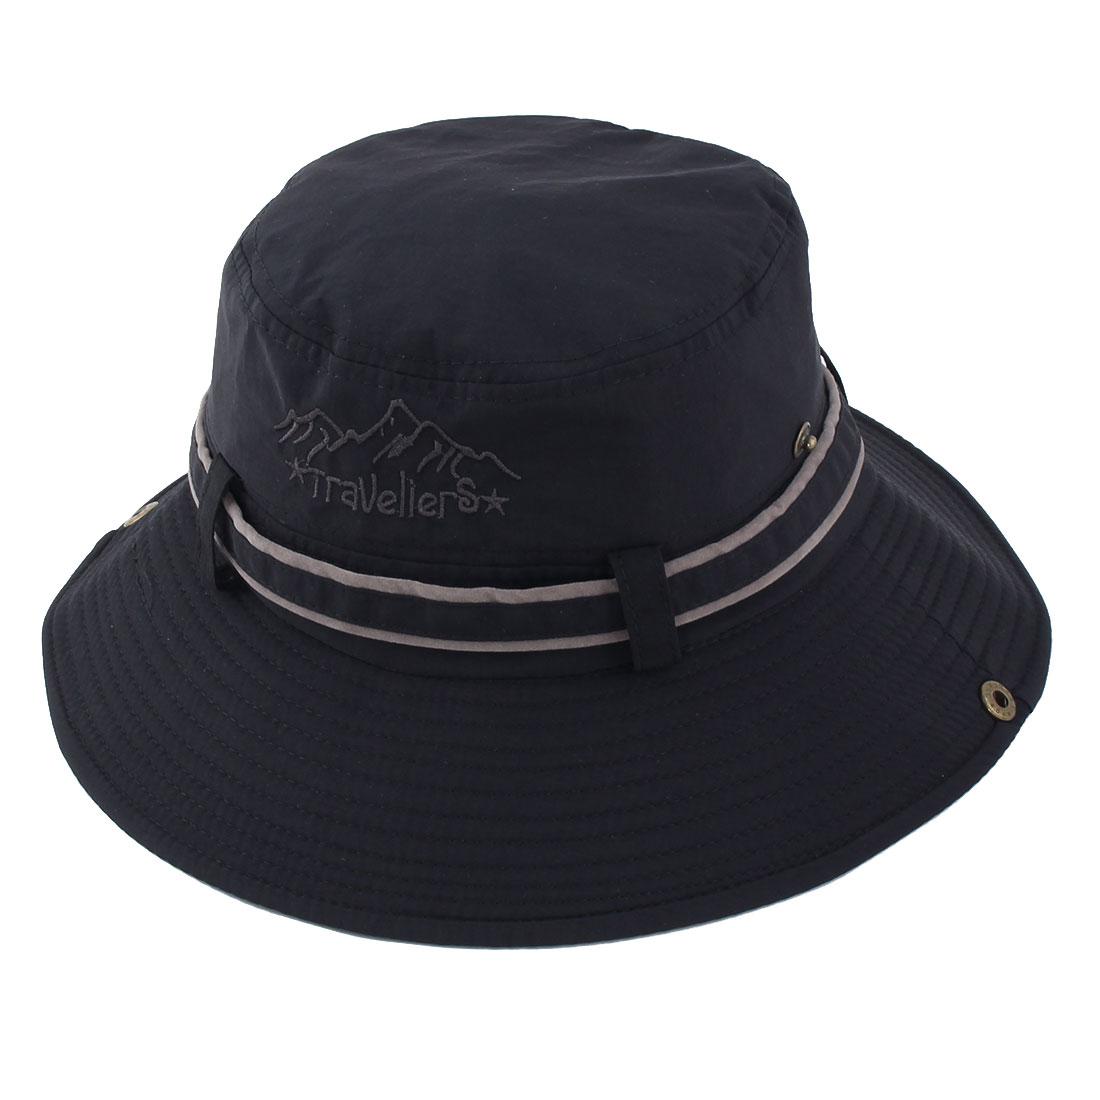 Fisherman Cotton Blends Outdoor Sports Climbing Hunting Adjustable Strap Wide Brim Bucket Summer Cap Fishing Hat Black